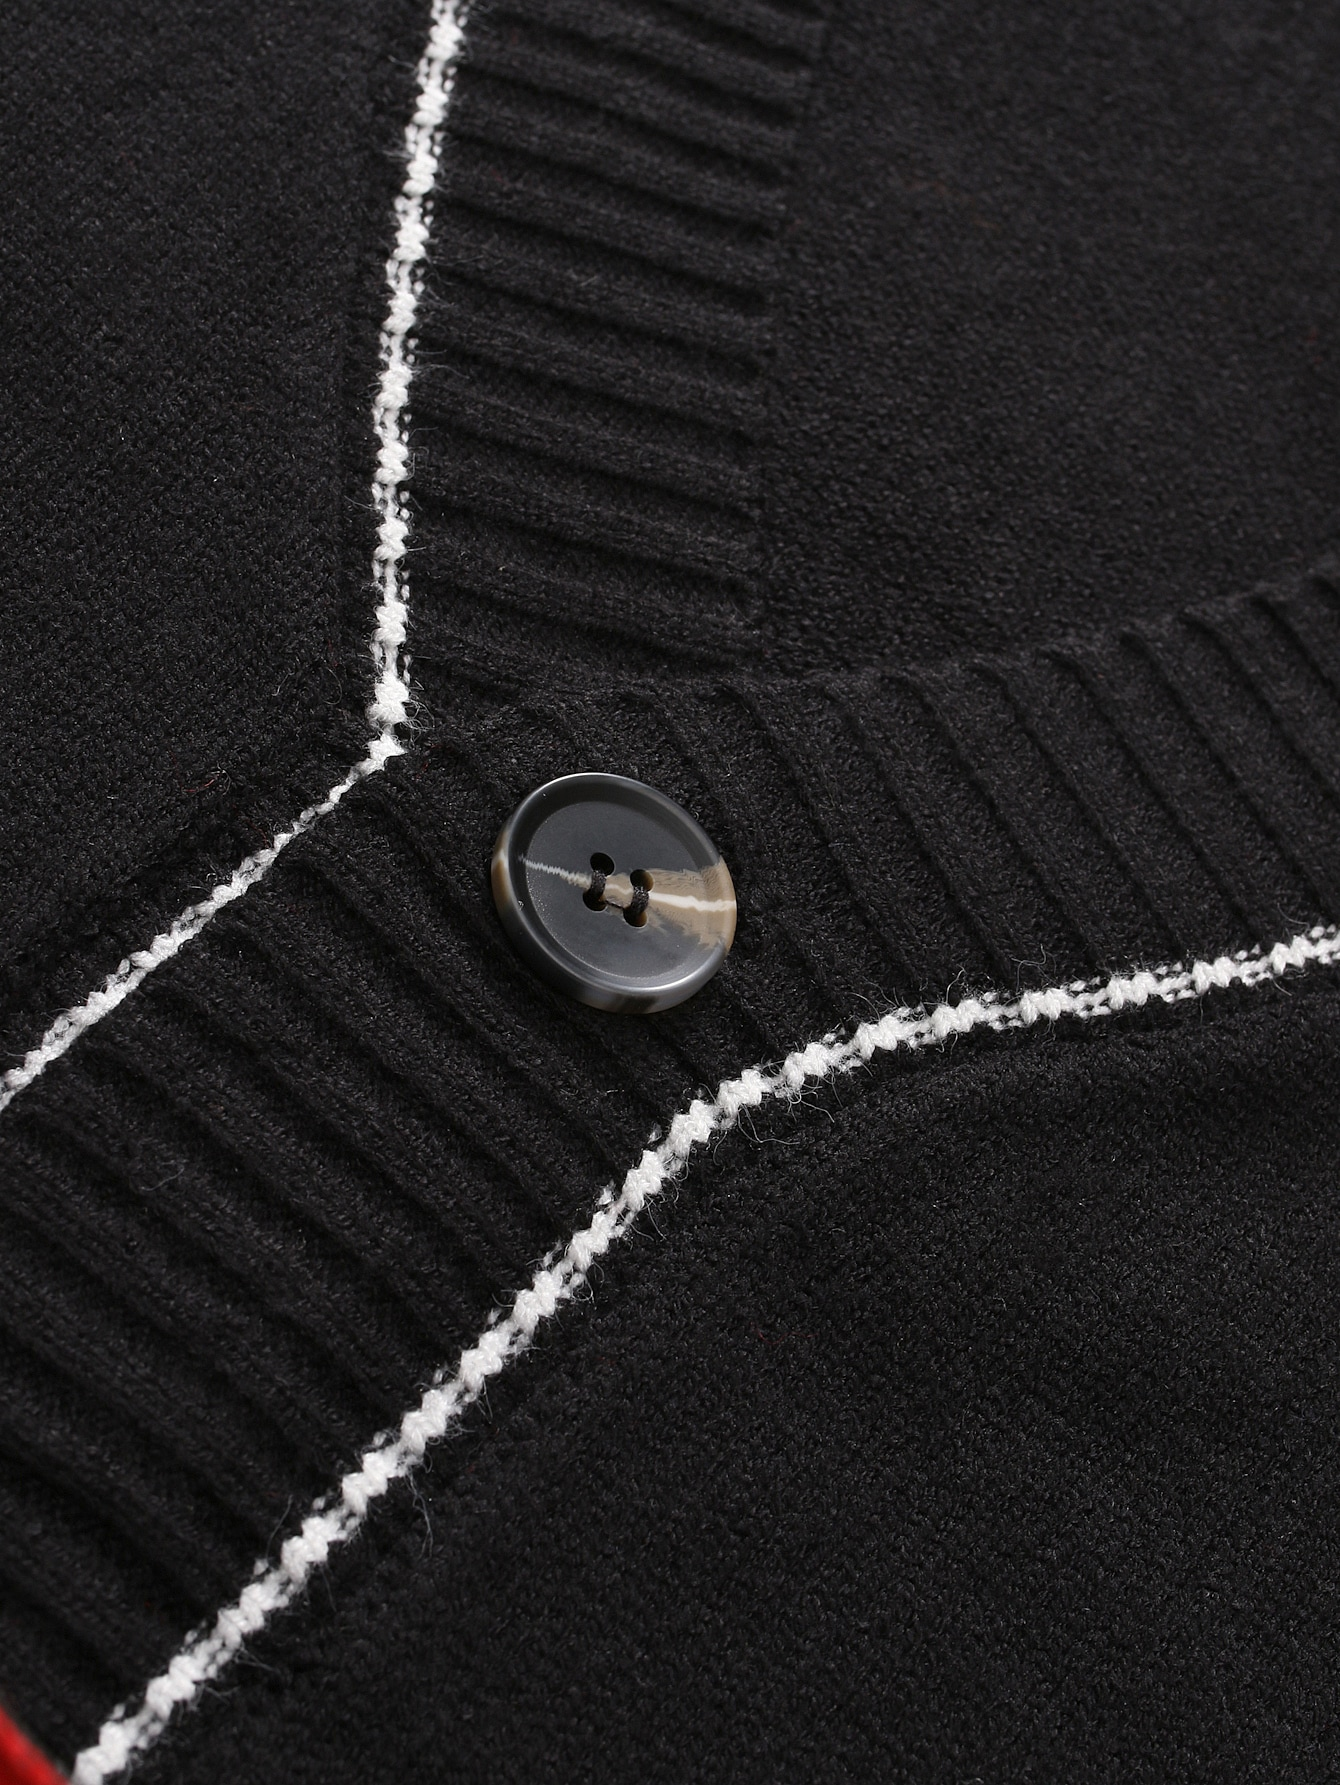 plus size shrug cardigan knit  long sleeve casual winter oversized Men Button Front V Neck sweater Cardigan